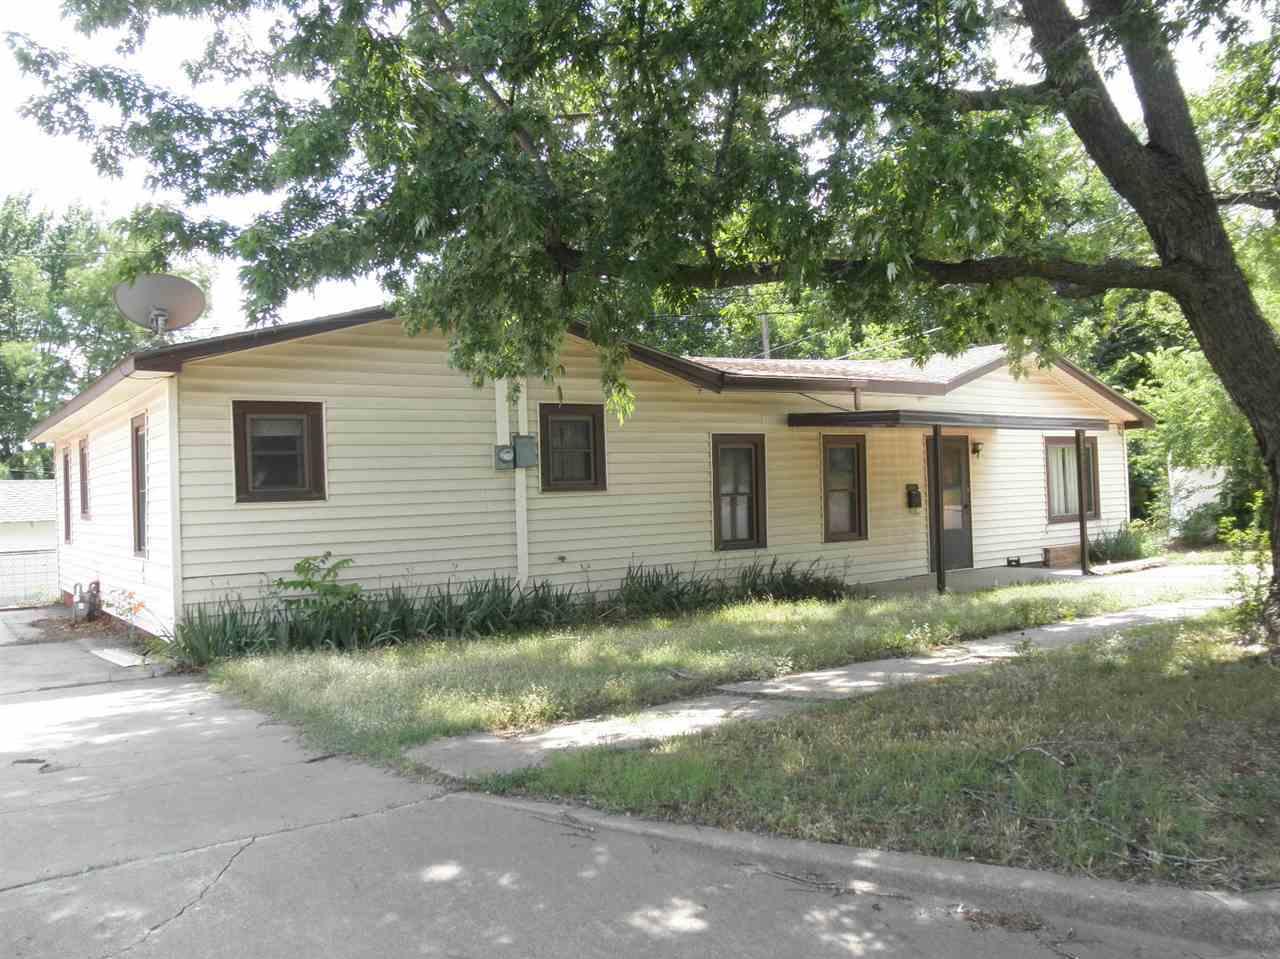 Sold Cross Sale W/ MLS | 916 E Cherry Ponca City, OK 74601 1